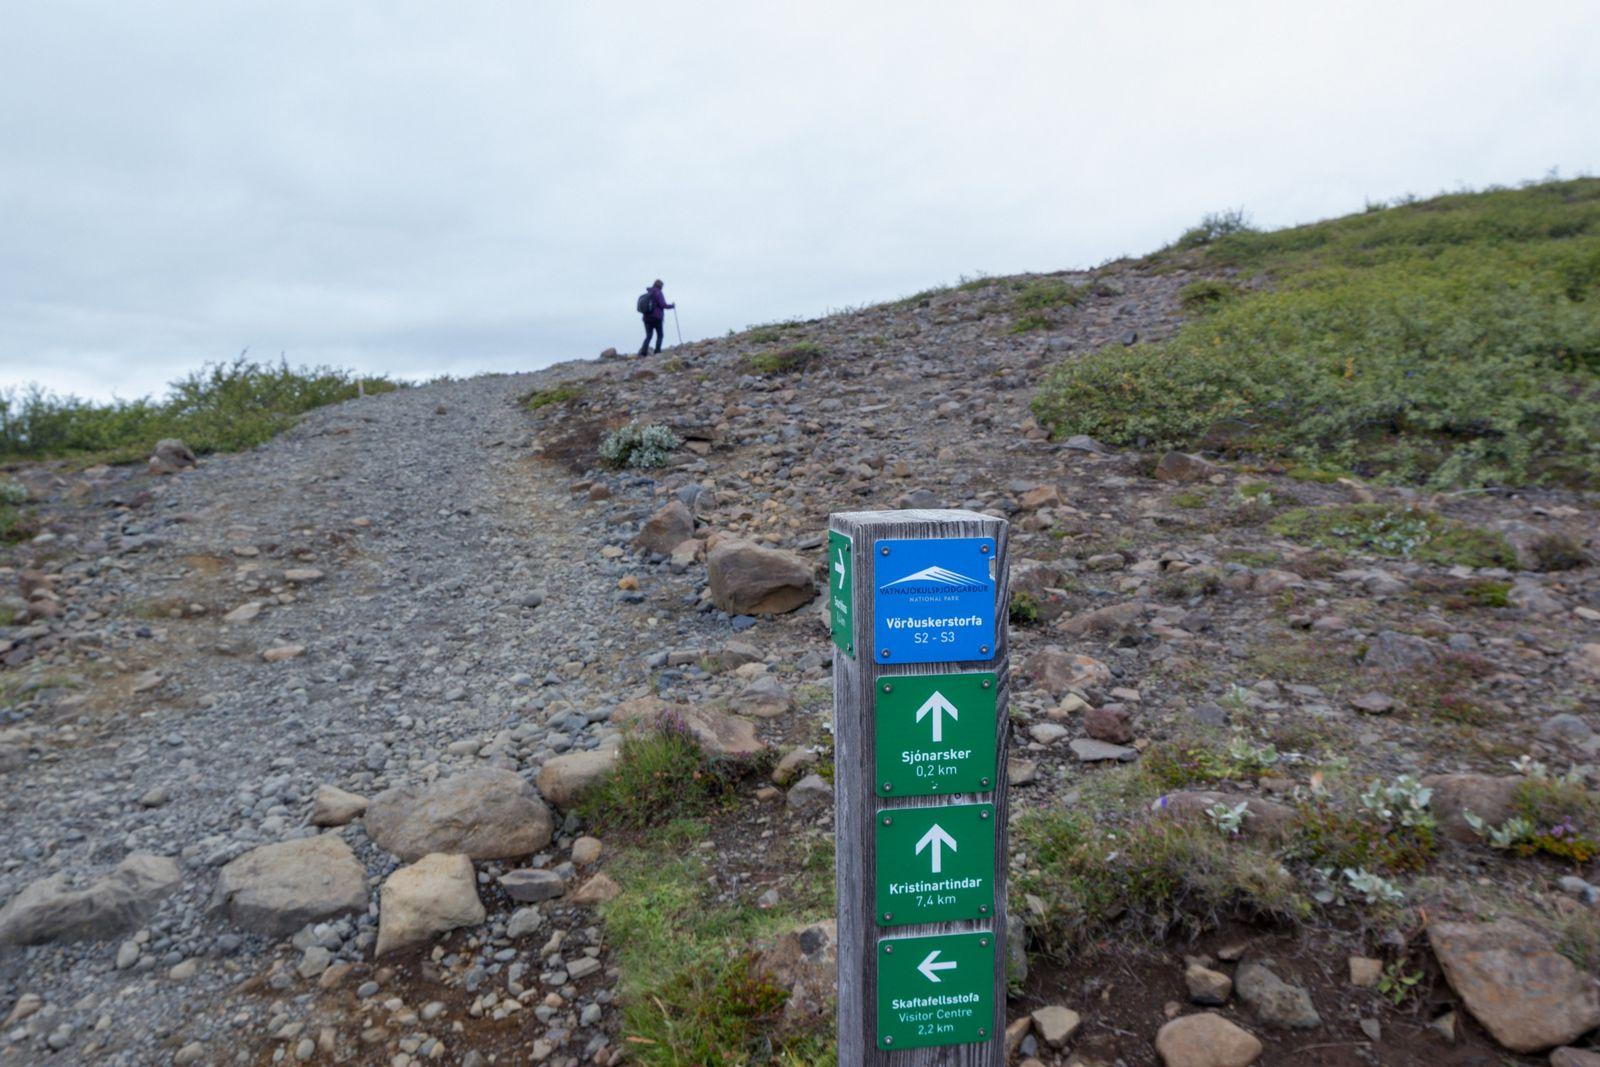 Los últimos metros hasta Sjónarsker